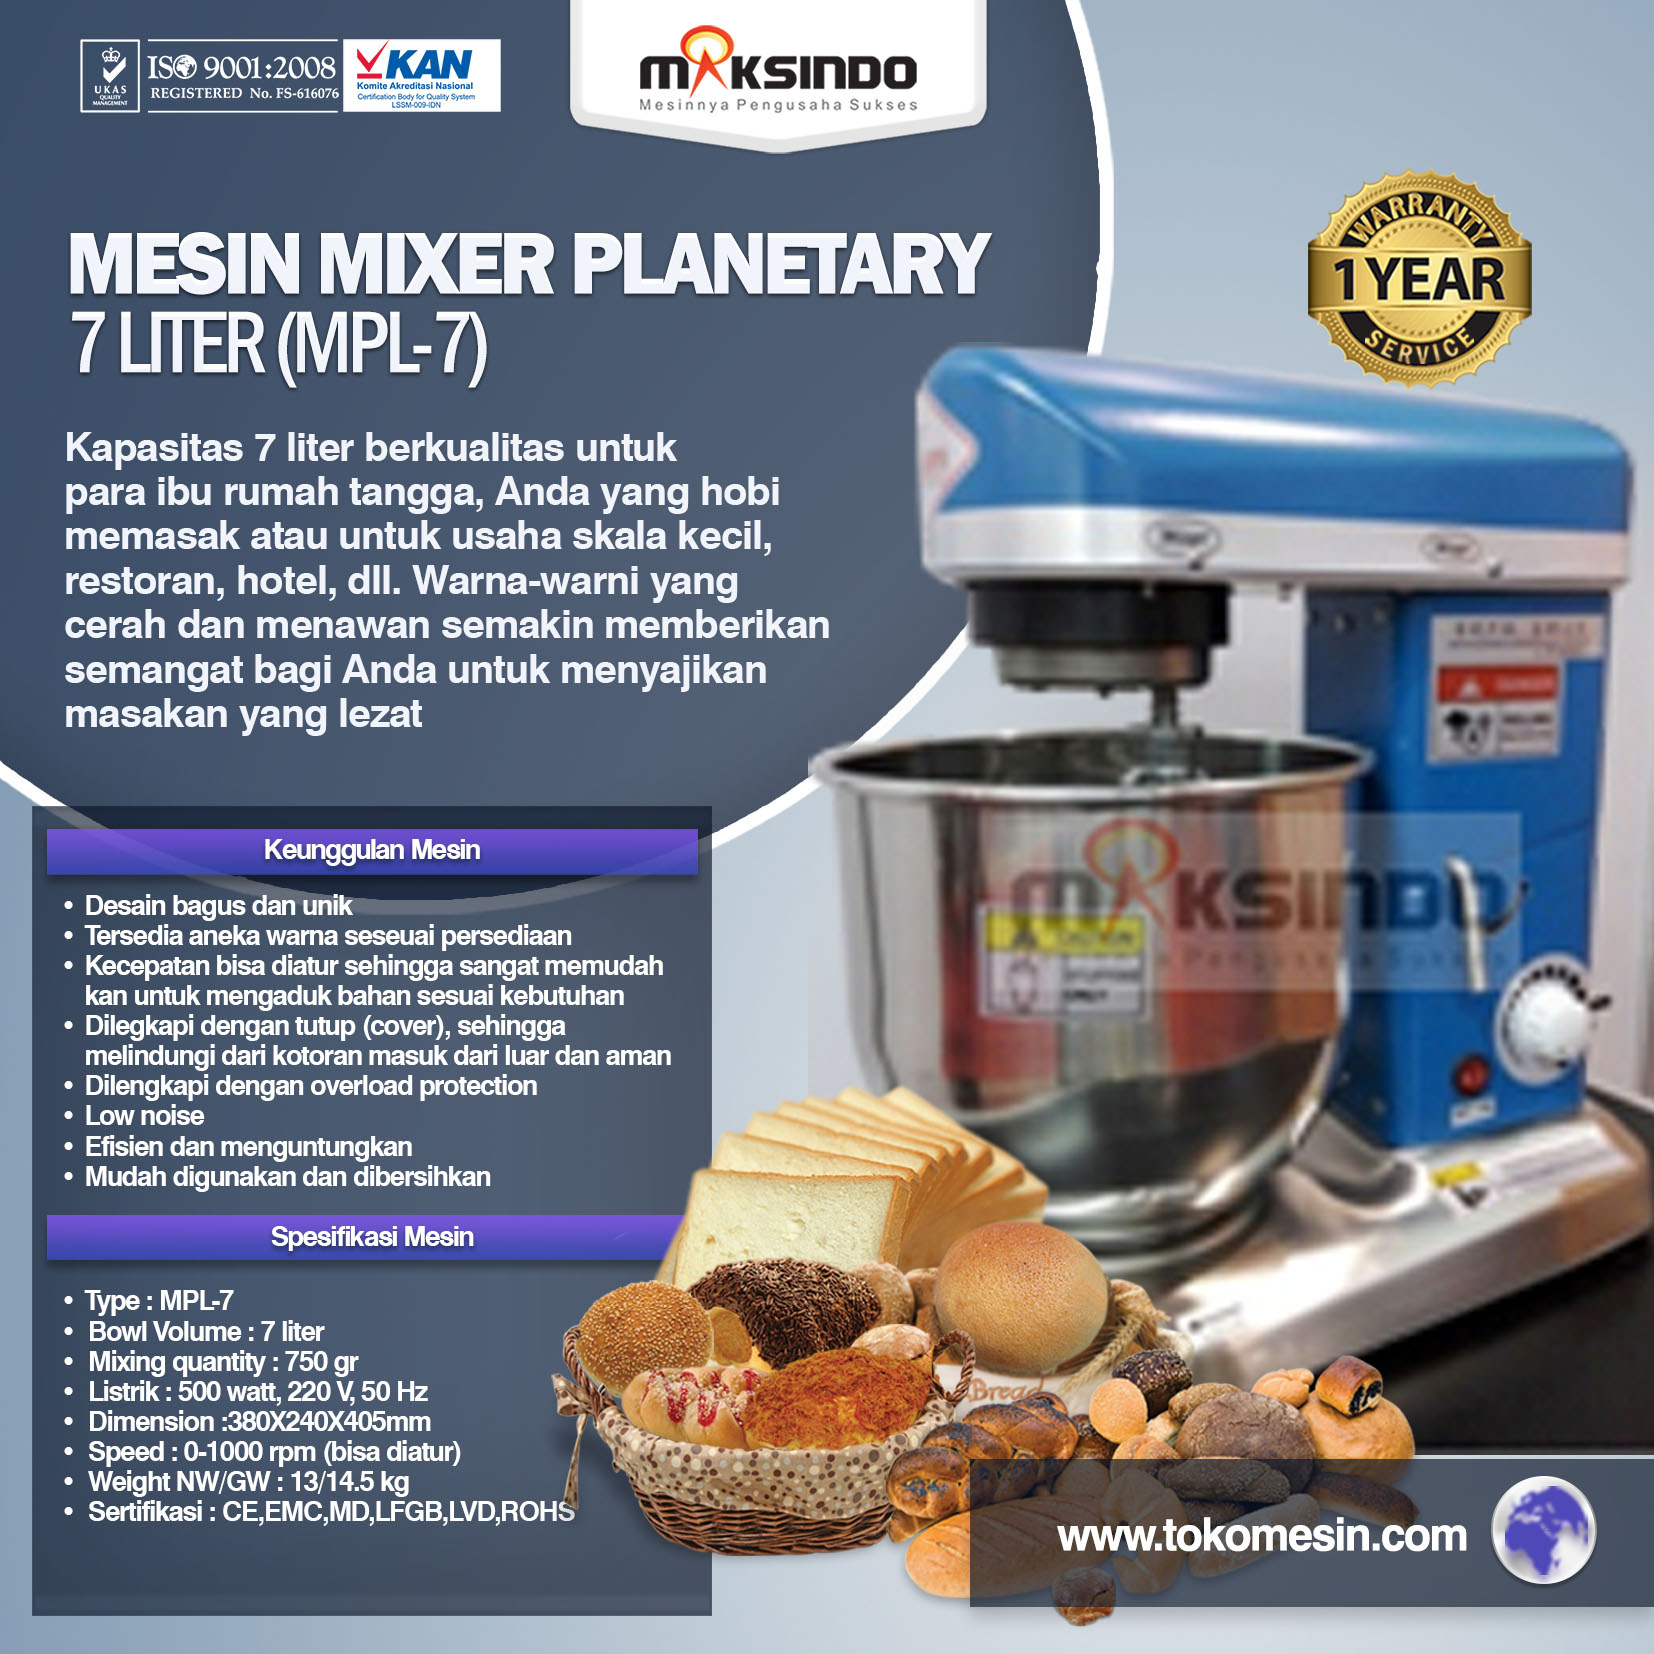 Index Of Wp Content Uploads 2017 01 Van Belt Utk Mesin Steam Mixer Planetary 7 Liter Mpl Blue